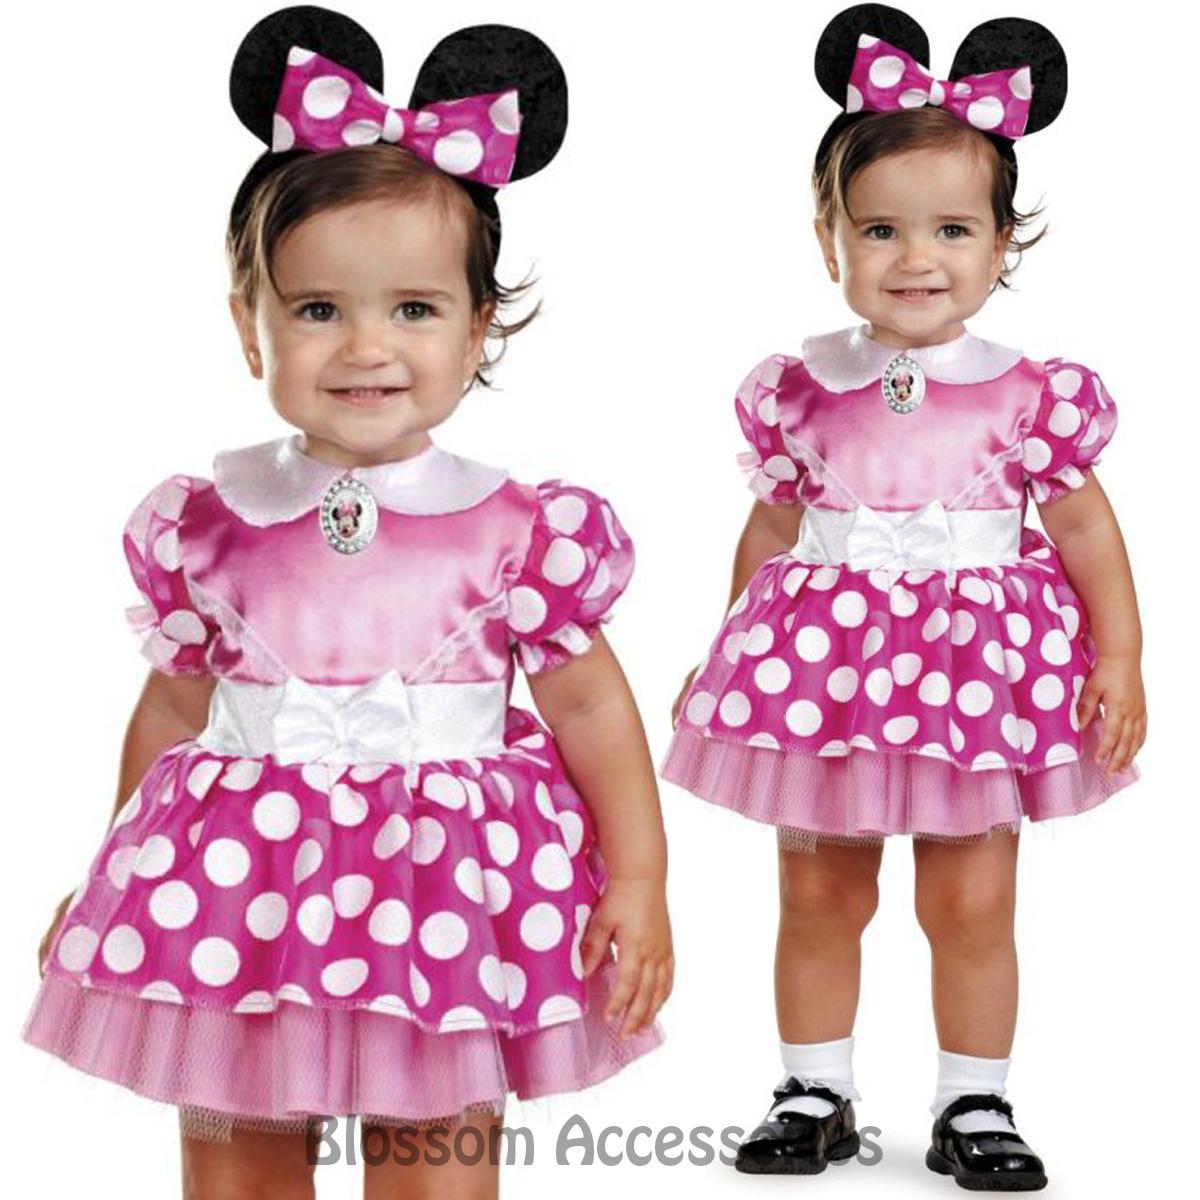 CK501 Pink Minnie Mouse Infant Disney Mini Girls Birthday